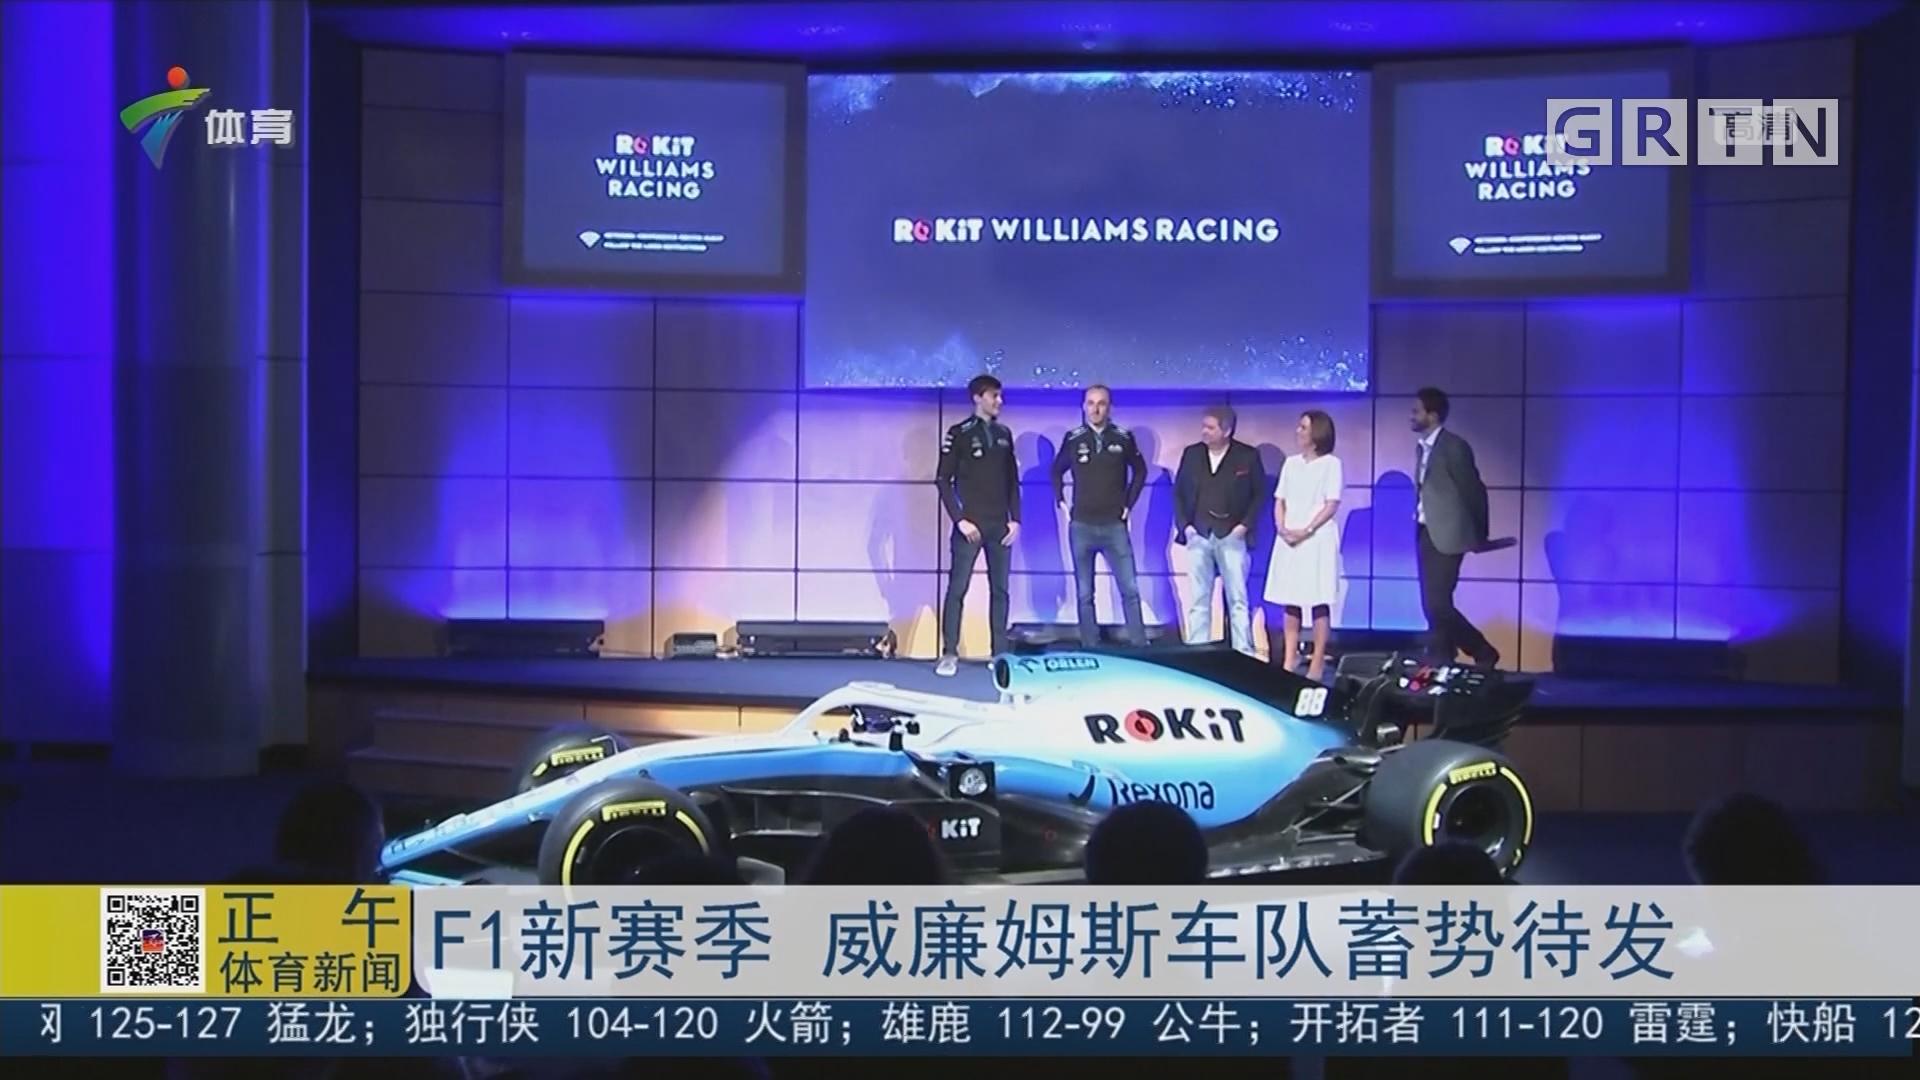 F1新赛季 威廉姆斯车队蓄势待发